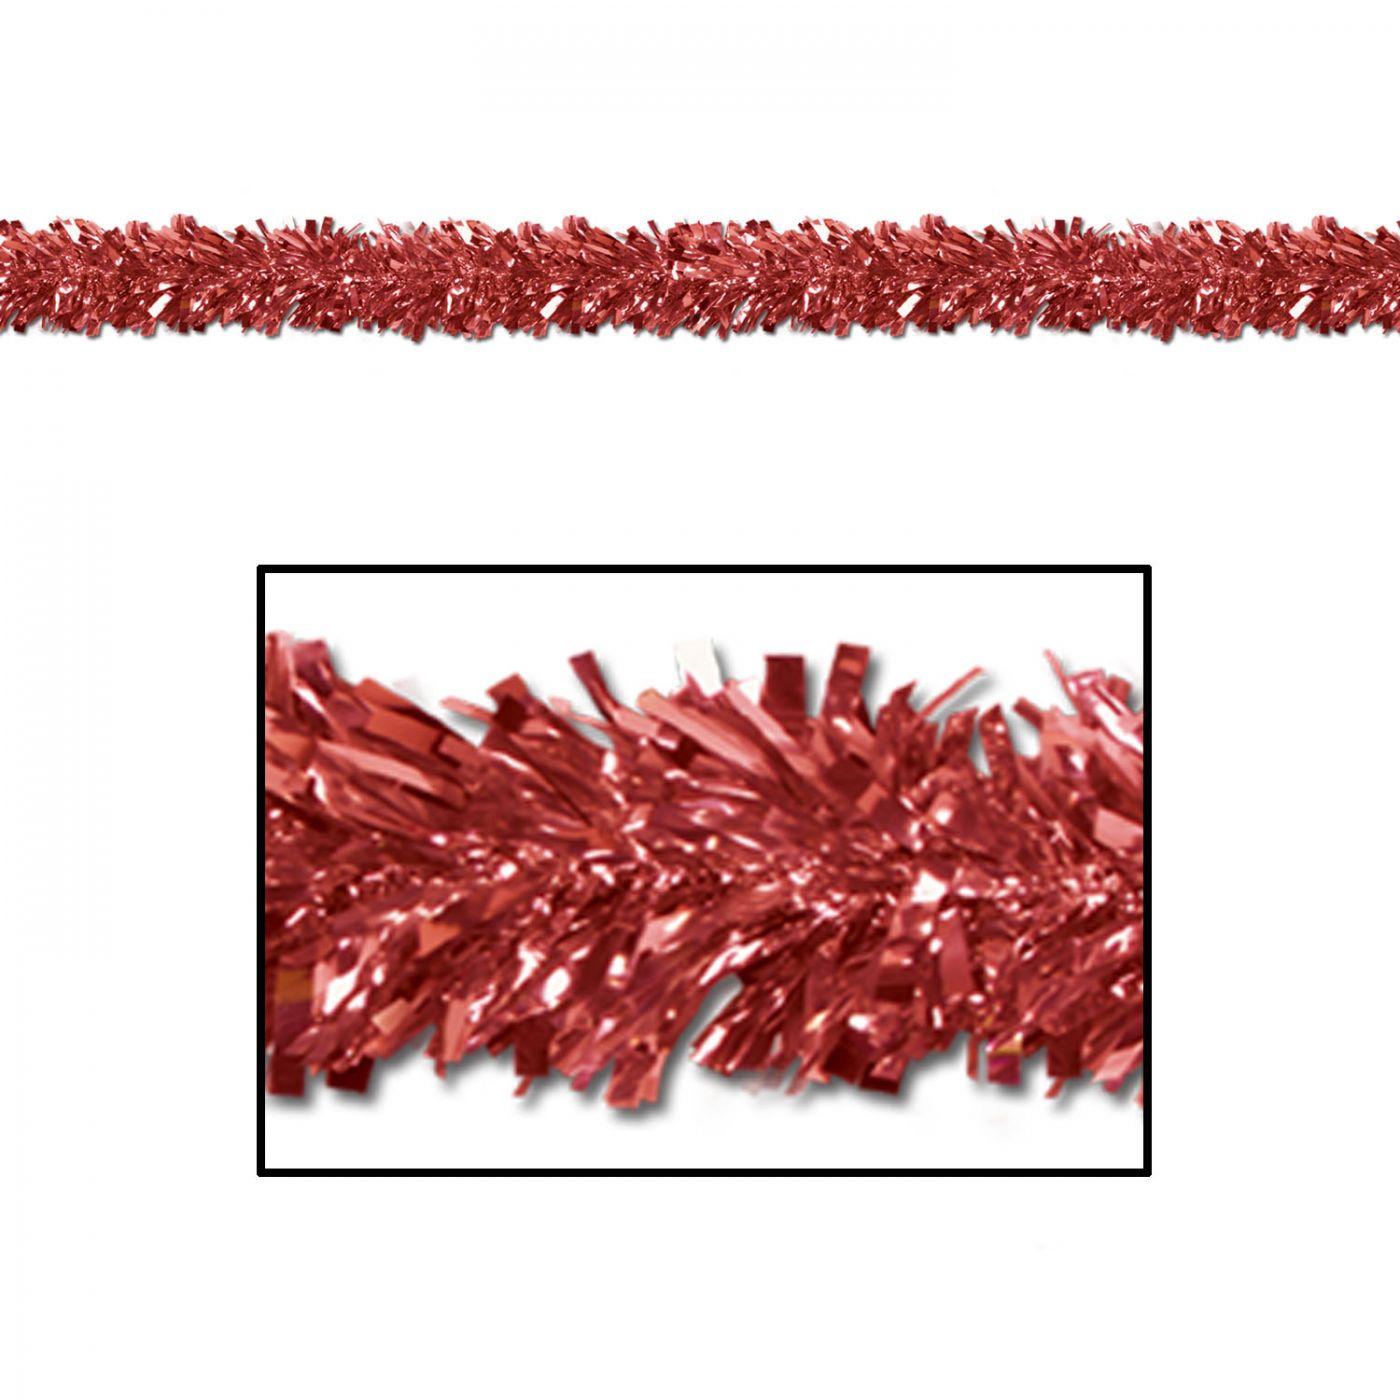 6-Ply FR Metallic Festooning Garland image